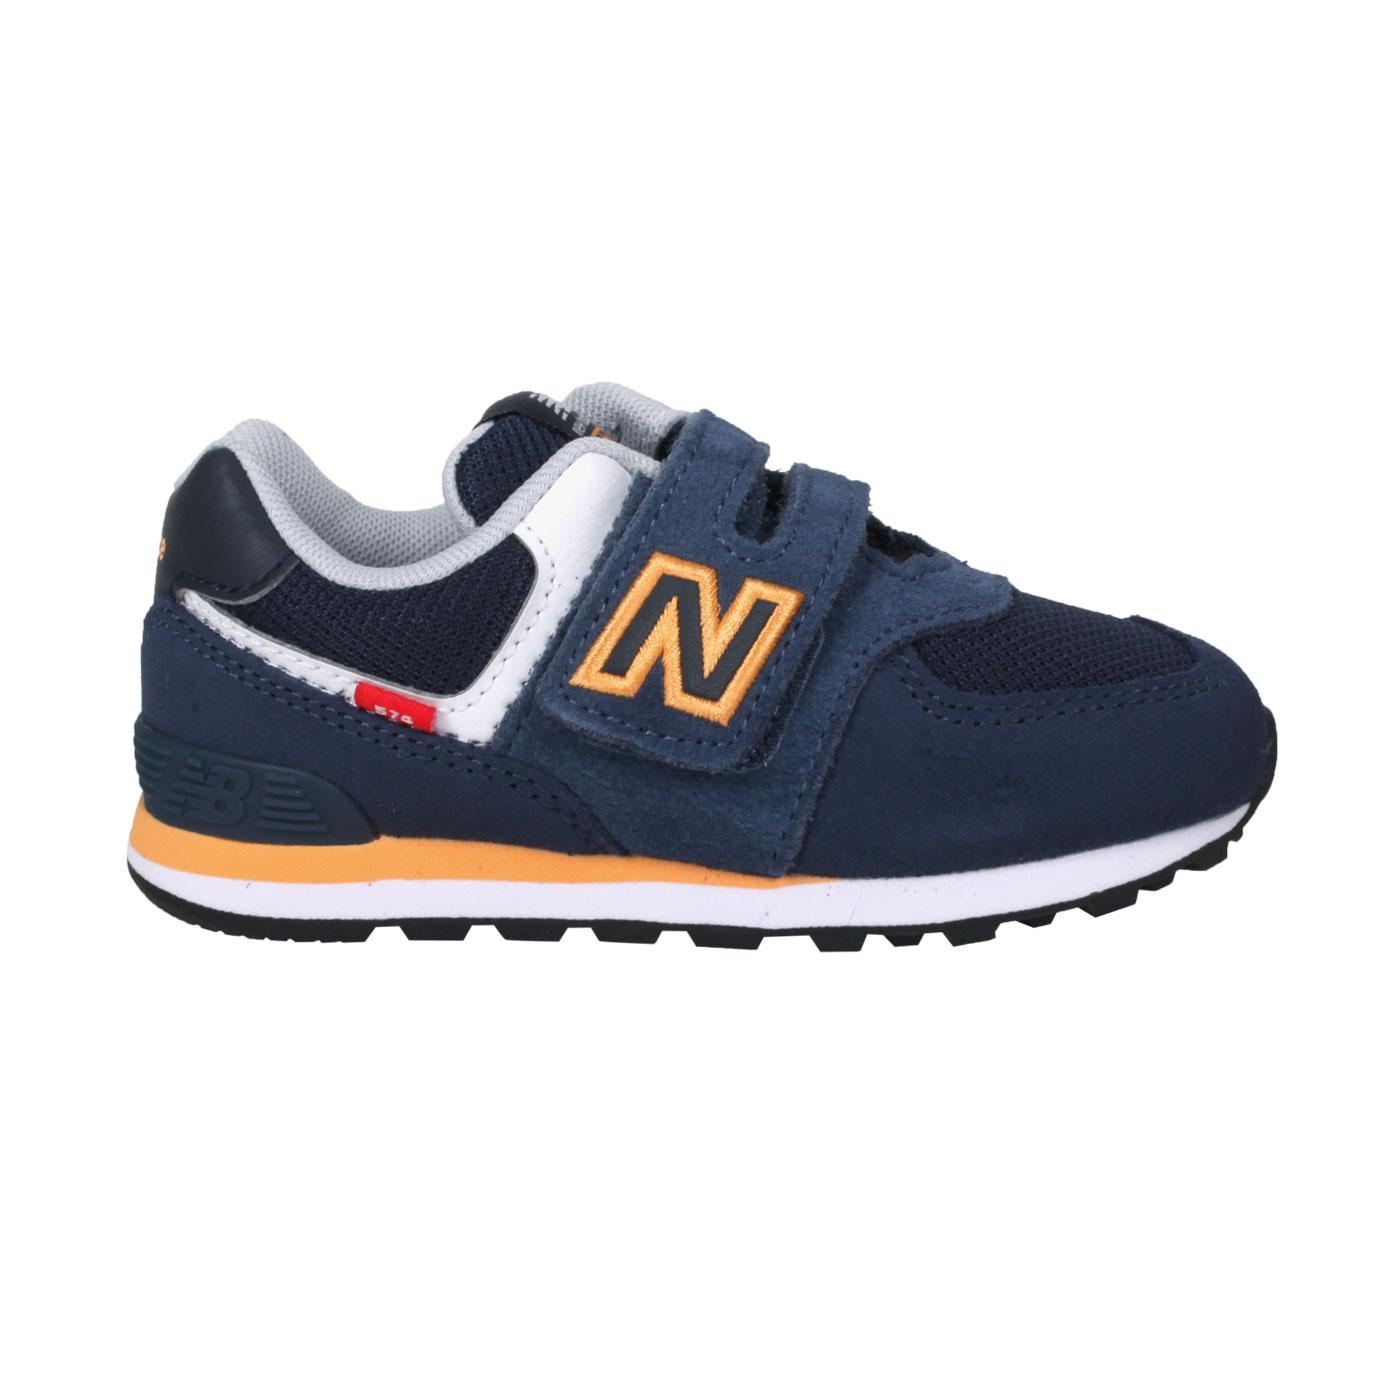 NEW BALANCE 小童休閒運動鞋-WIDE IV574SY2 - 深藍橘